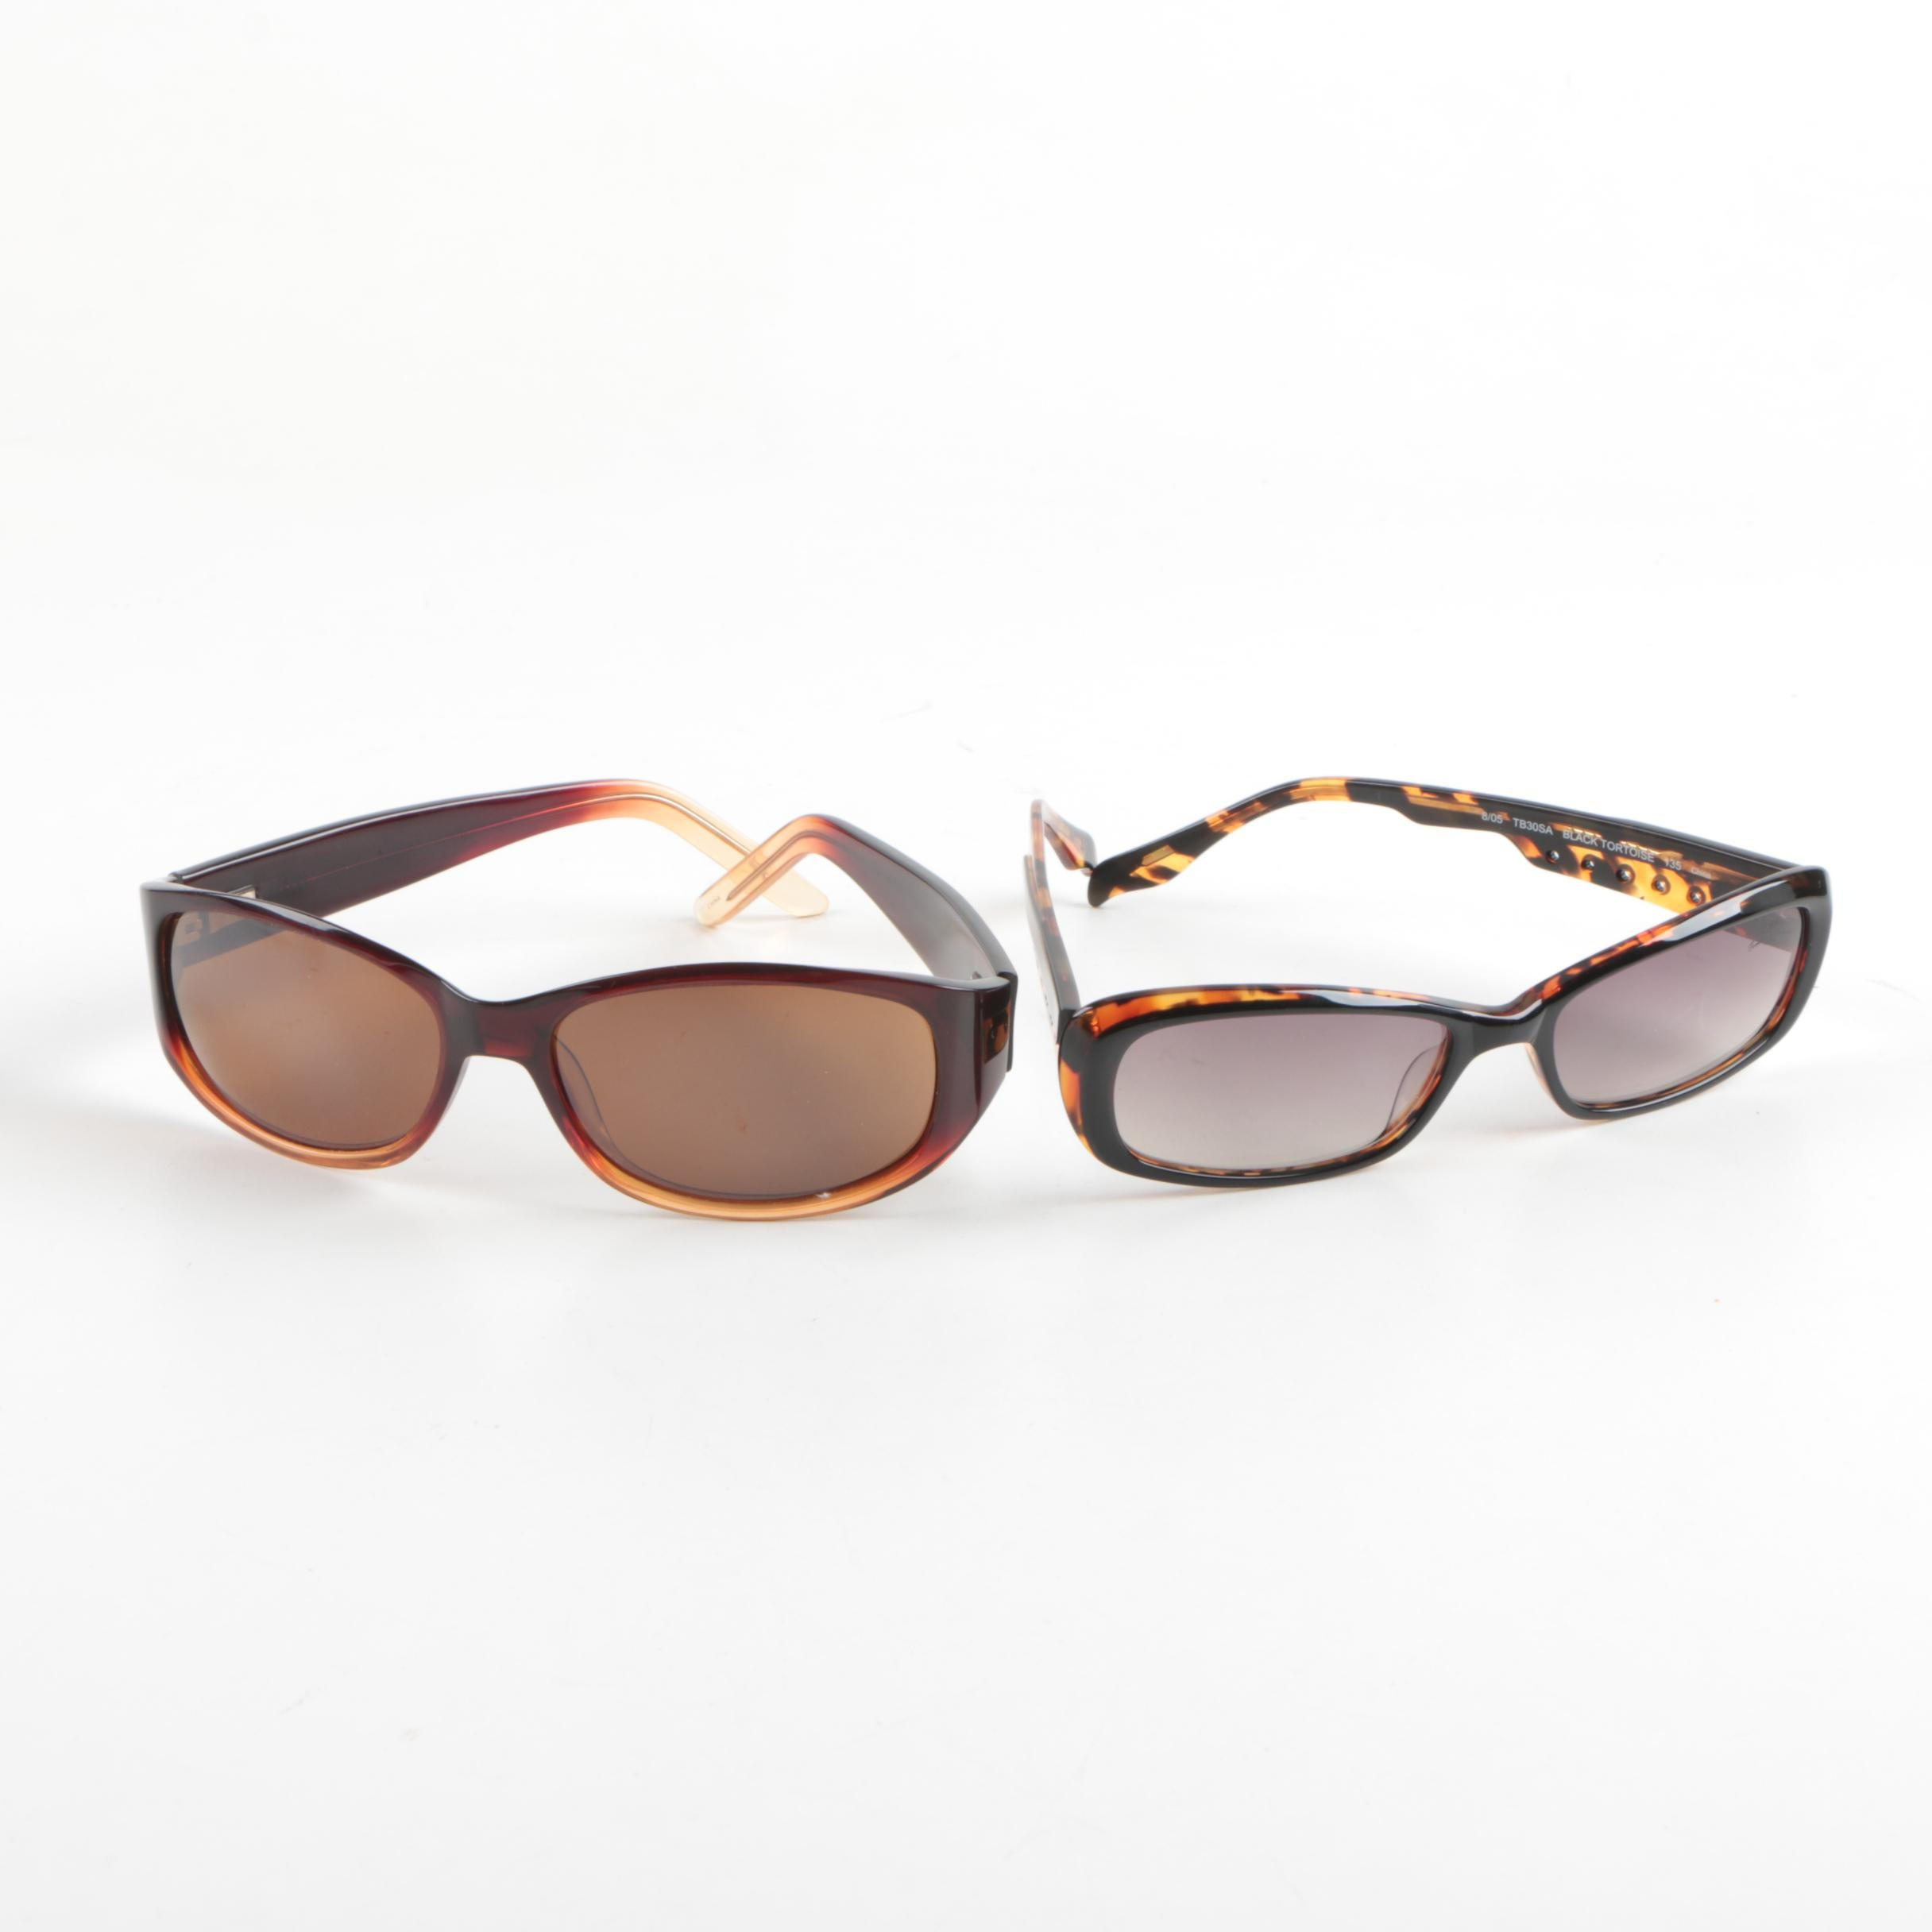 Tommy Bahama TB30SA and Pacific Traders Hawaiian Collection Sunglasses